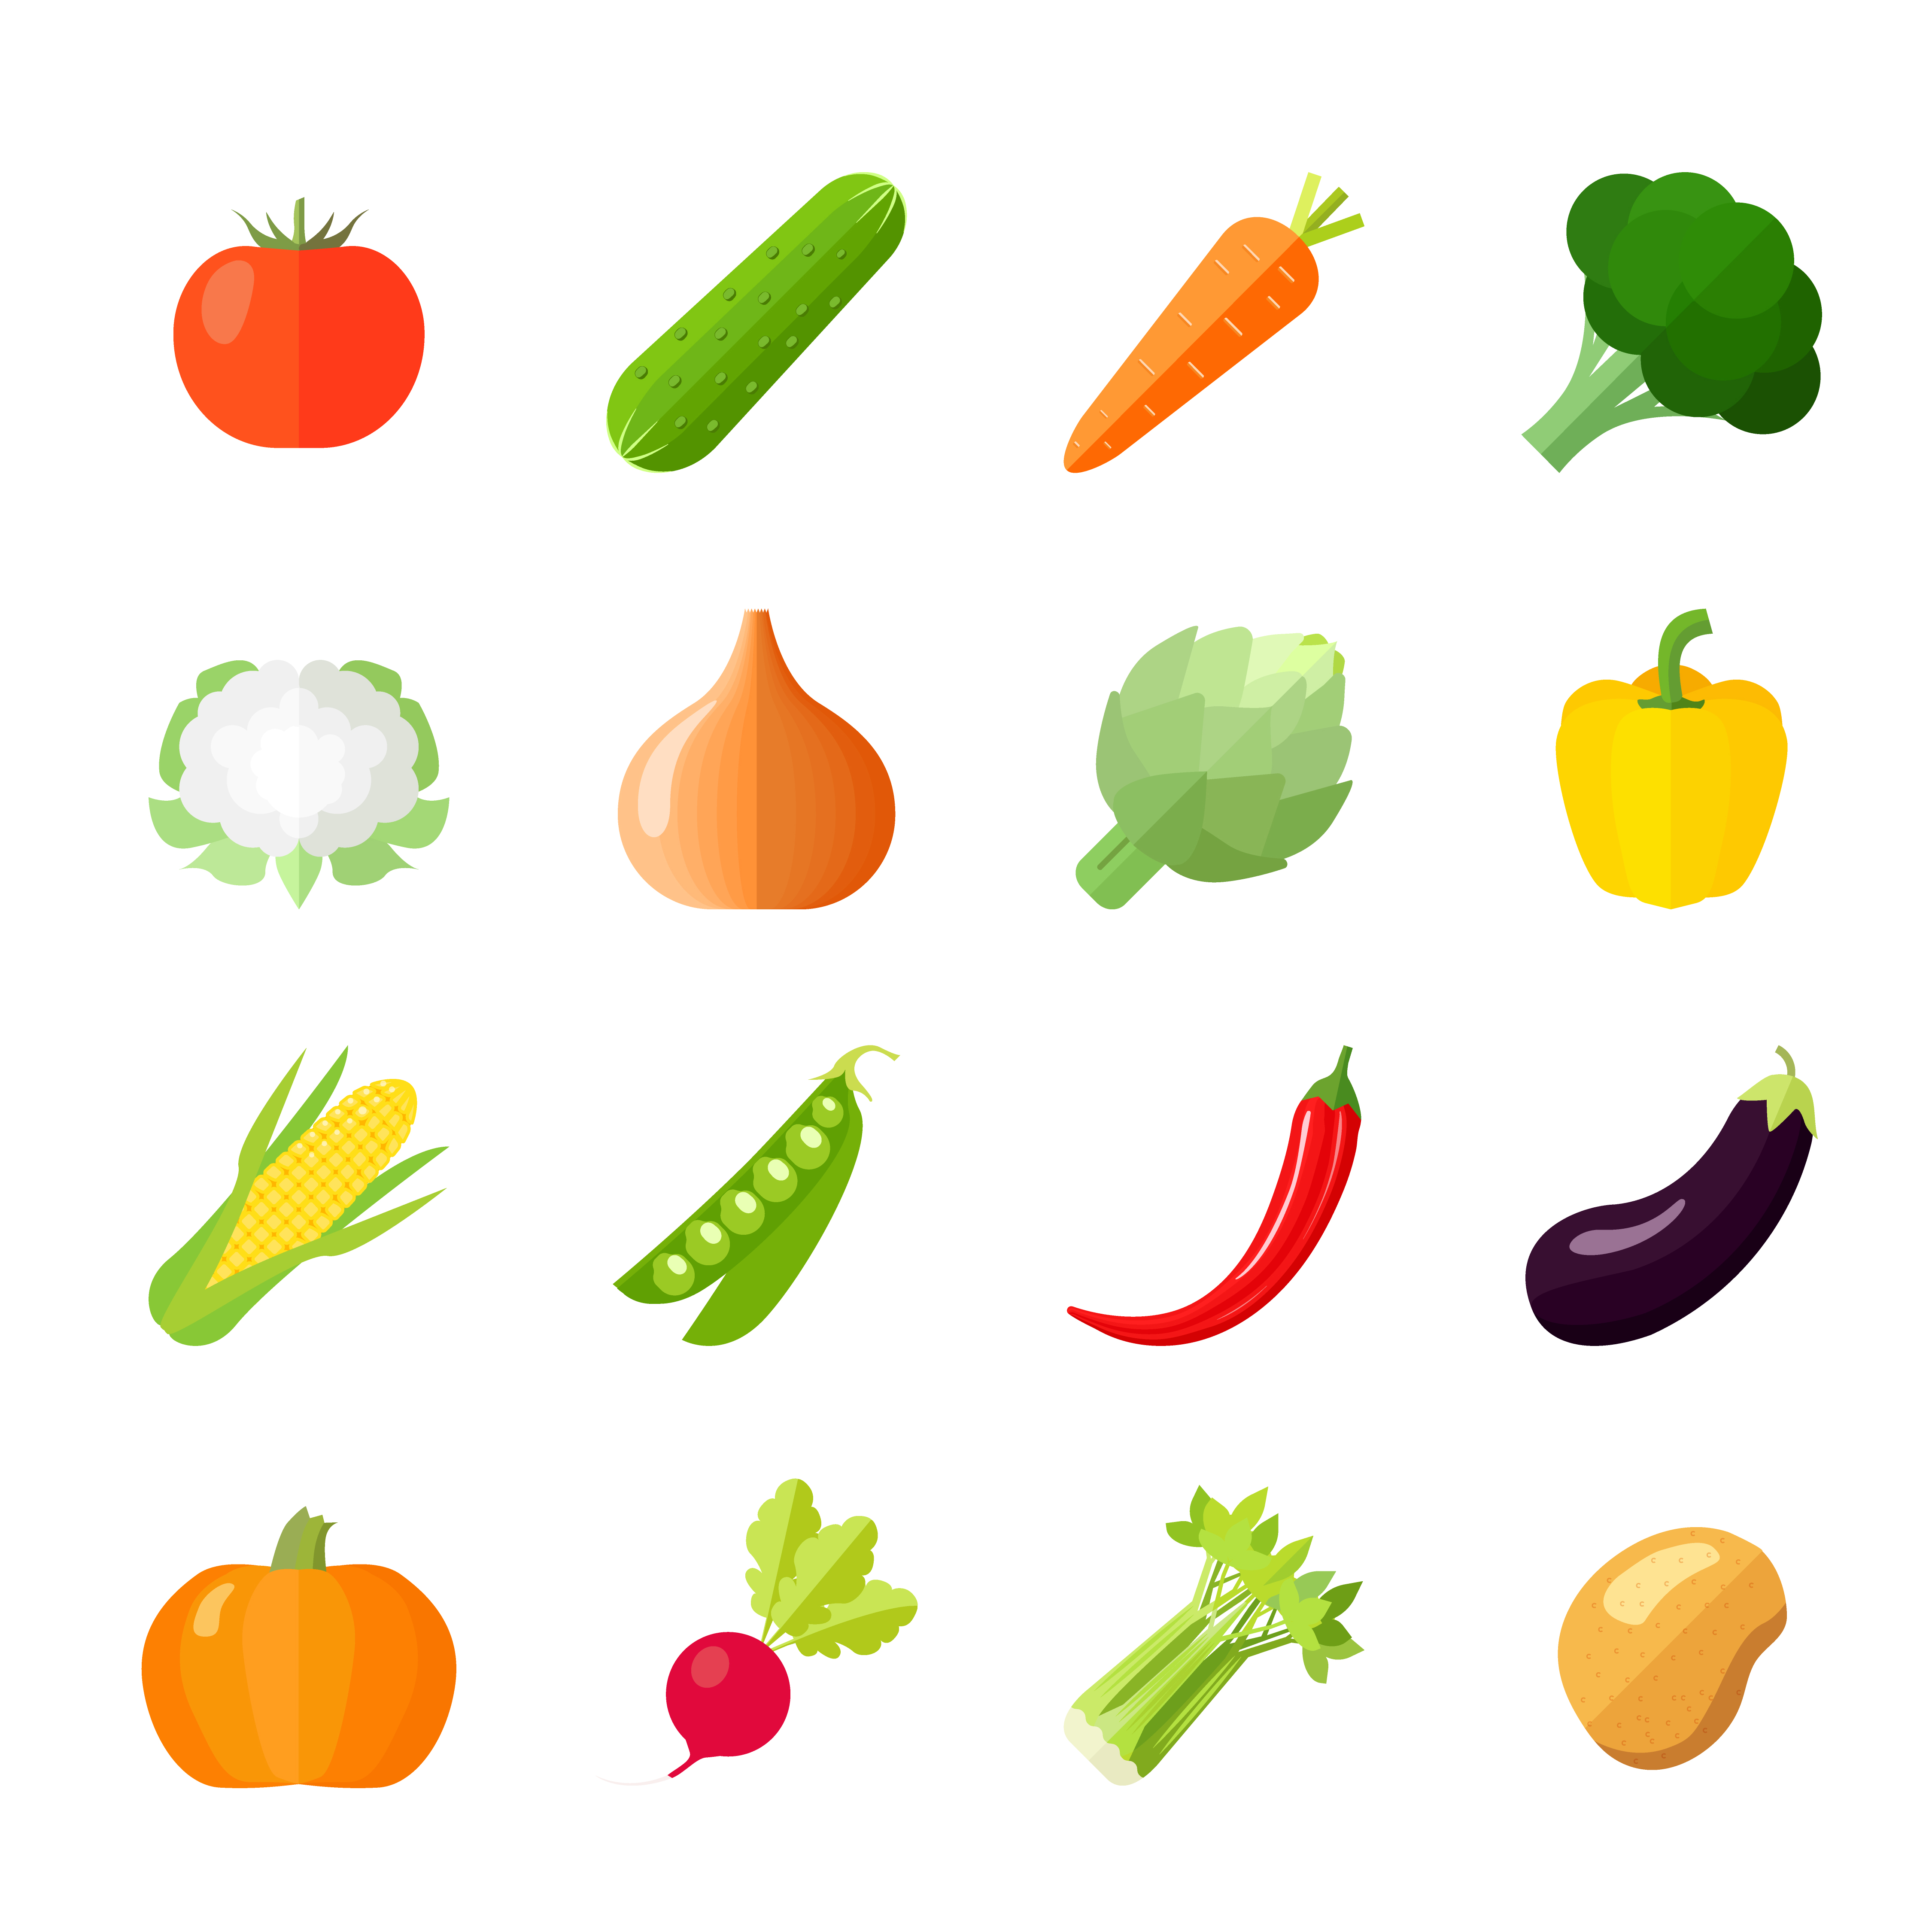 Vegetables Icons Flat - Download Free Vectors, Clipart